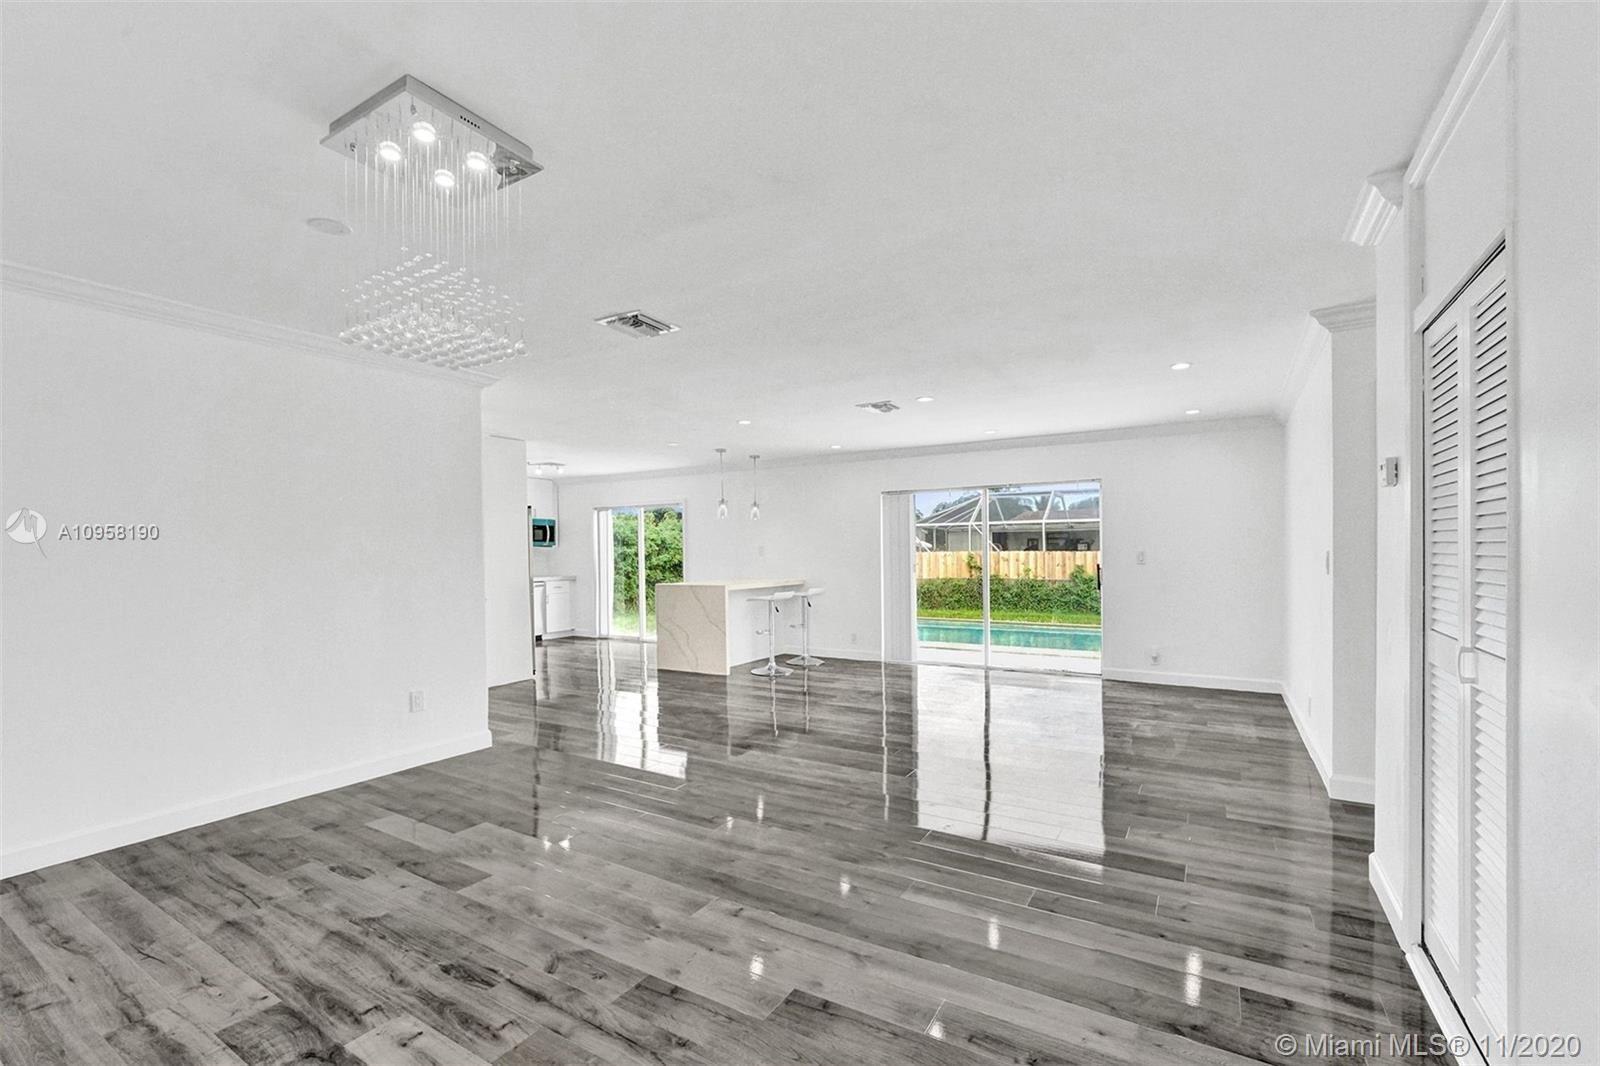 Photo of 6303 Southgate Blvd, Margate, FL 33068 (MLS # A10958190)